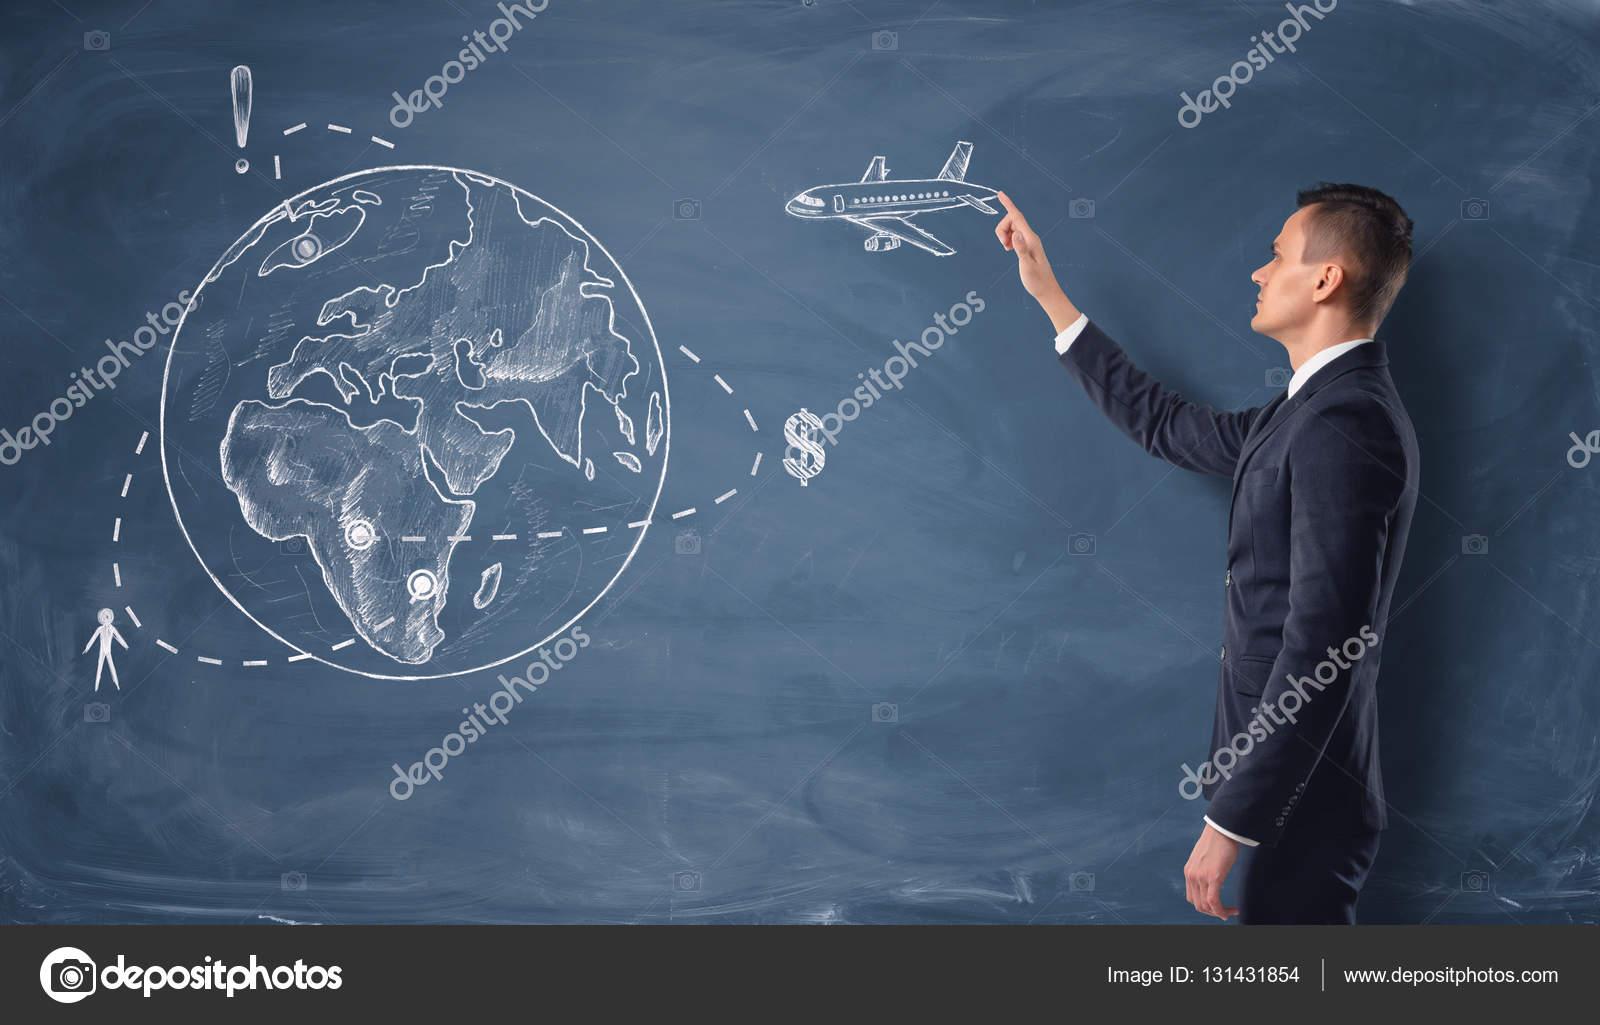 Drawn globe chalkboard With chalkboard on touching globe